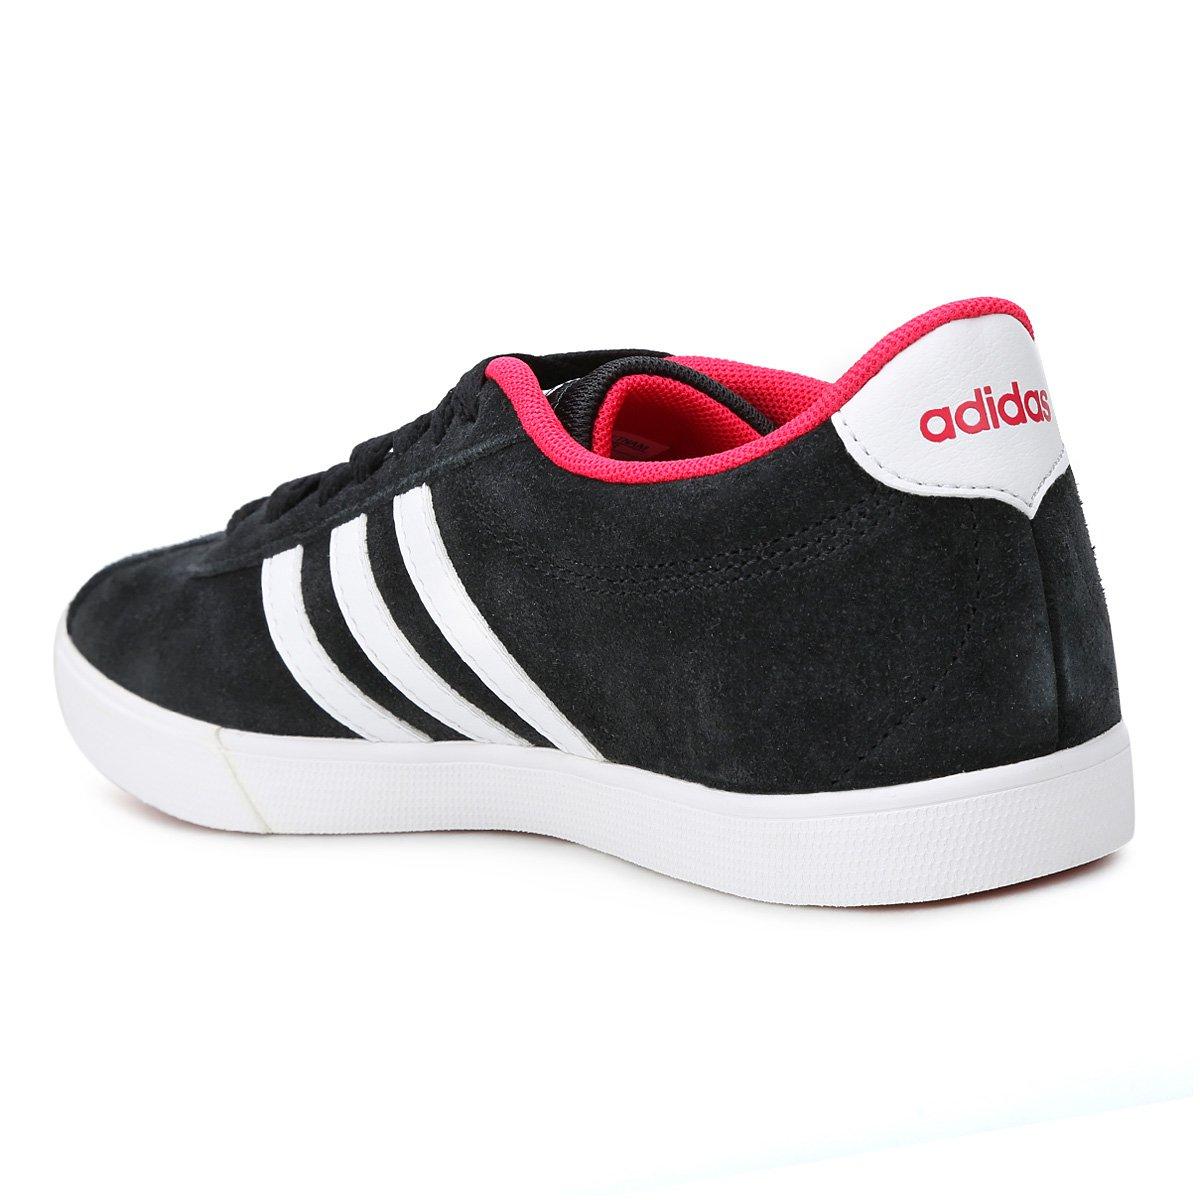 2fddff1052 Tênis Adidas Courtset Feminino